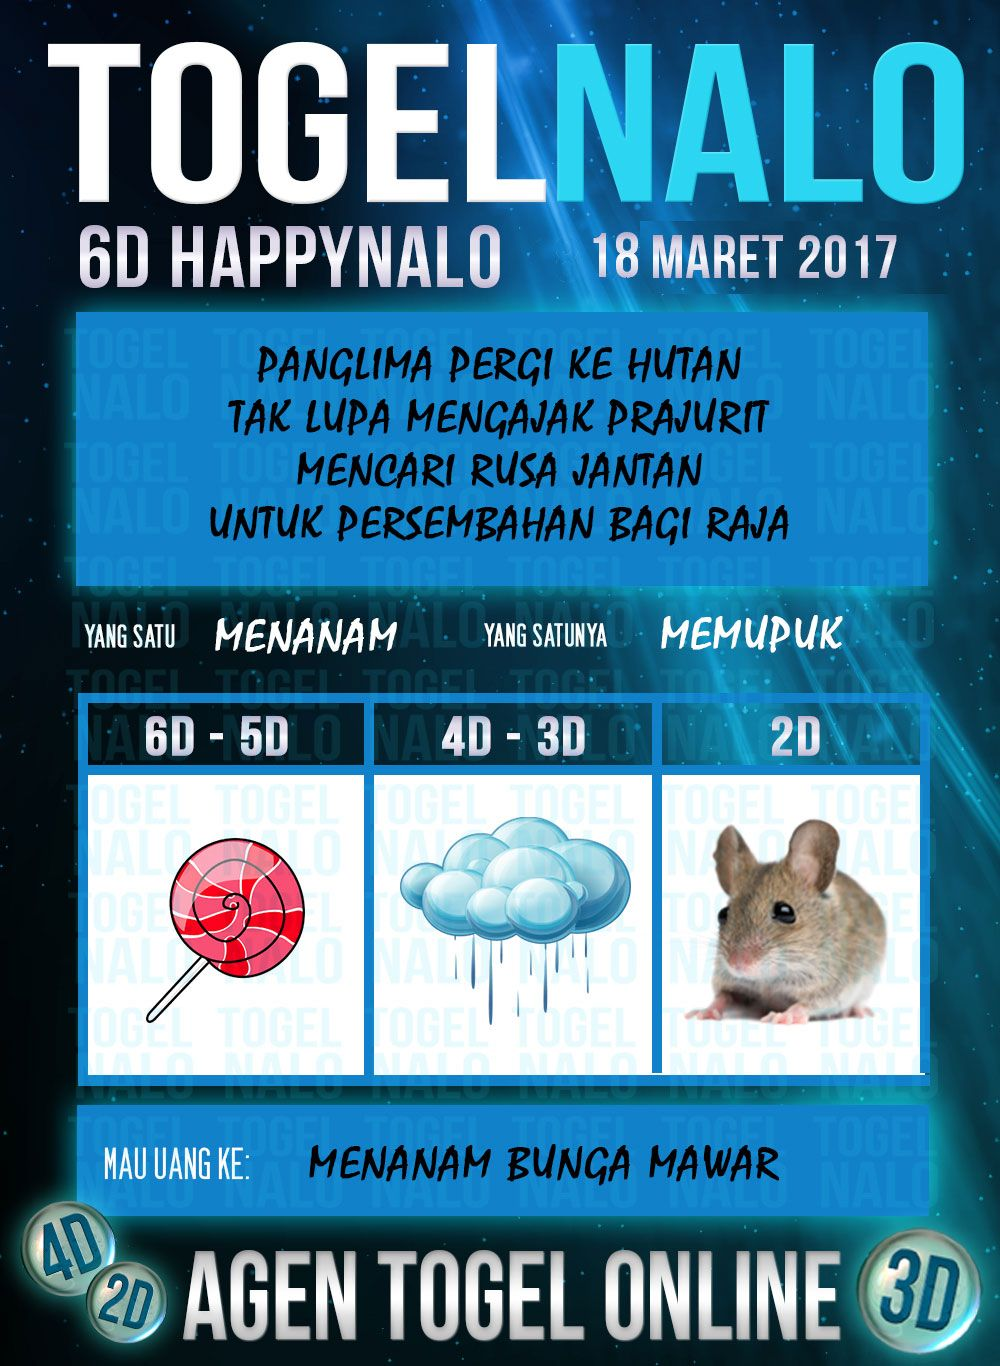 Bocoran 2D Togel Wap Online Kupon HappyNalo Jakarta 18 Maret 2017